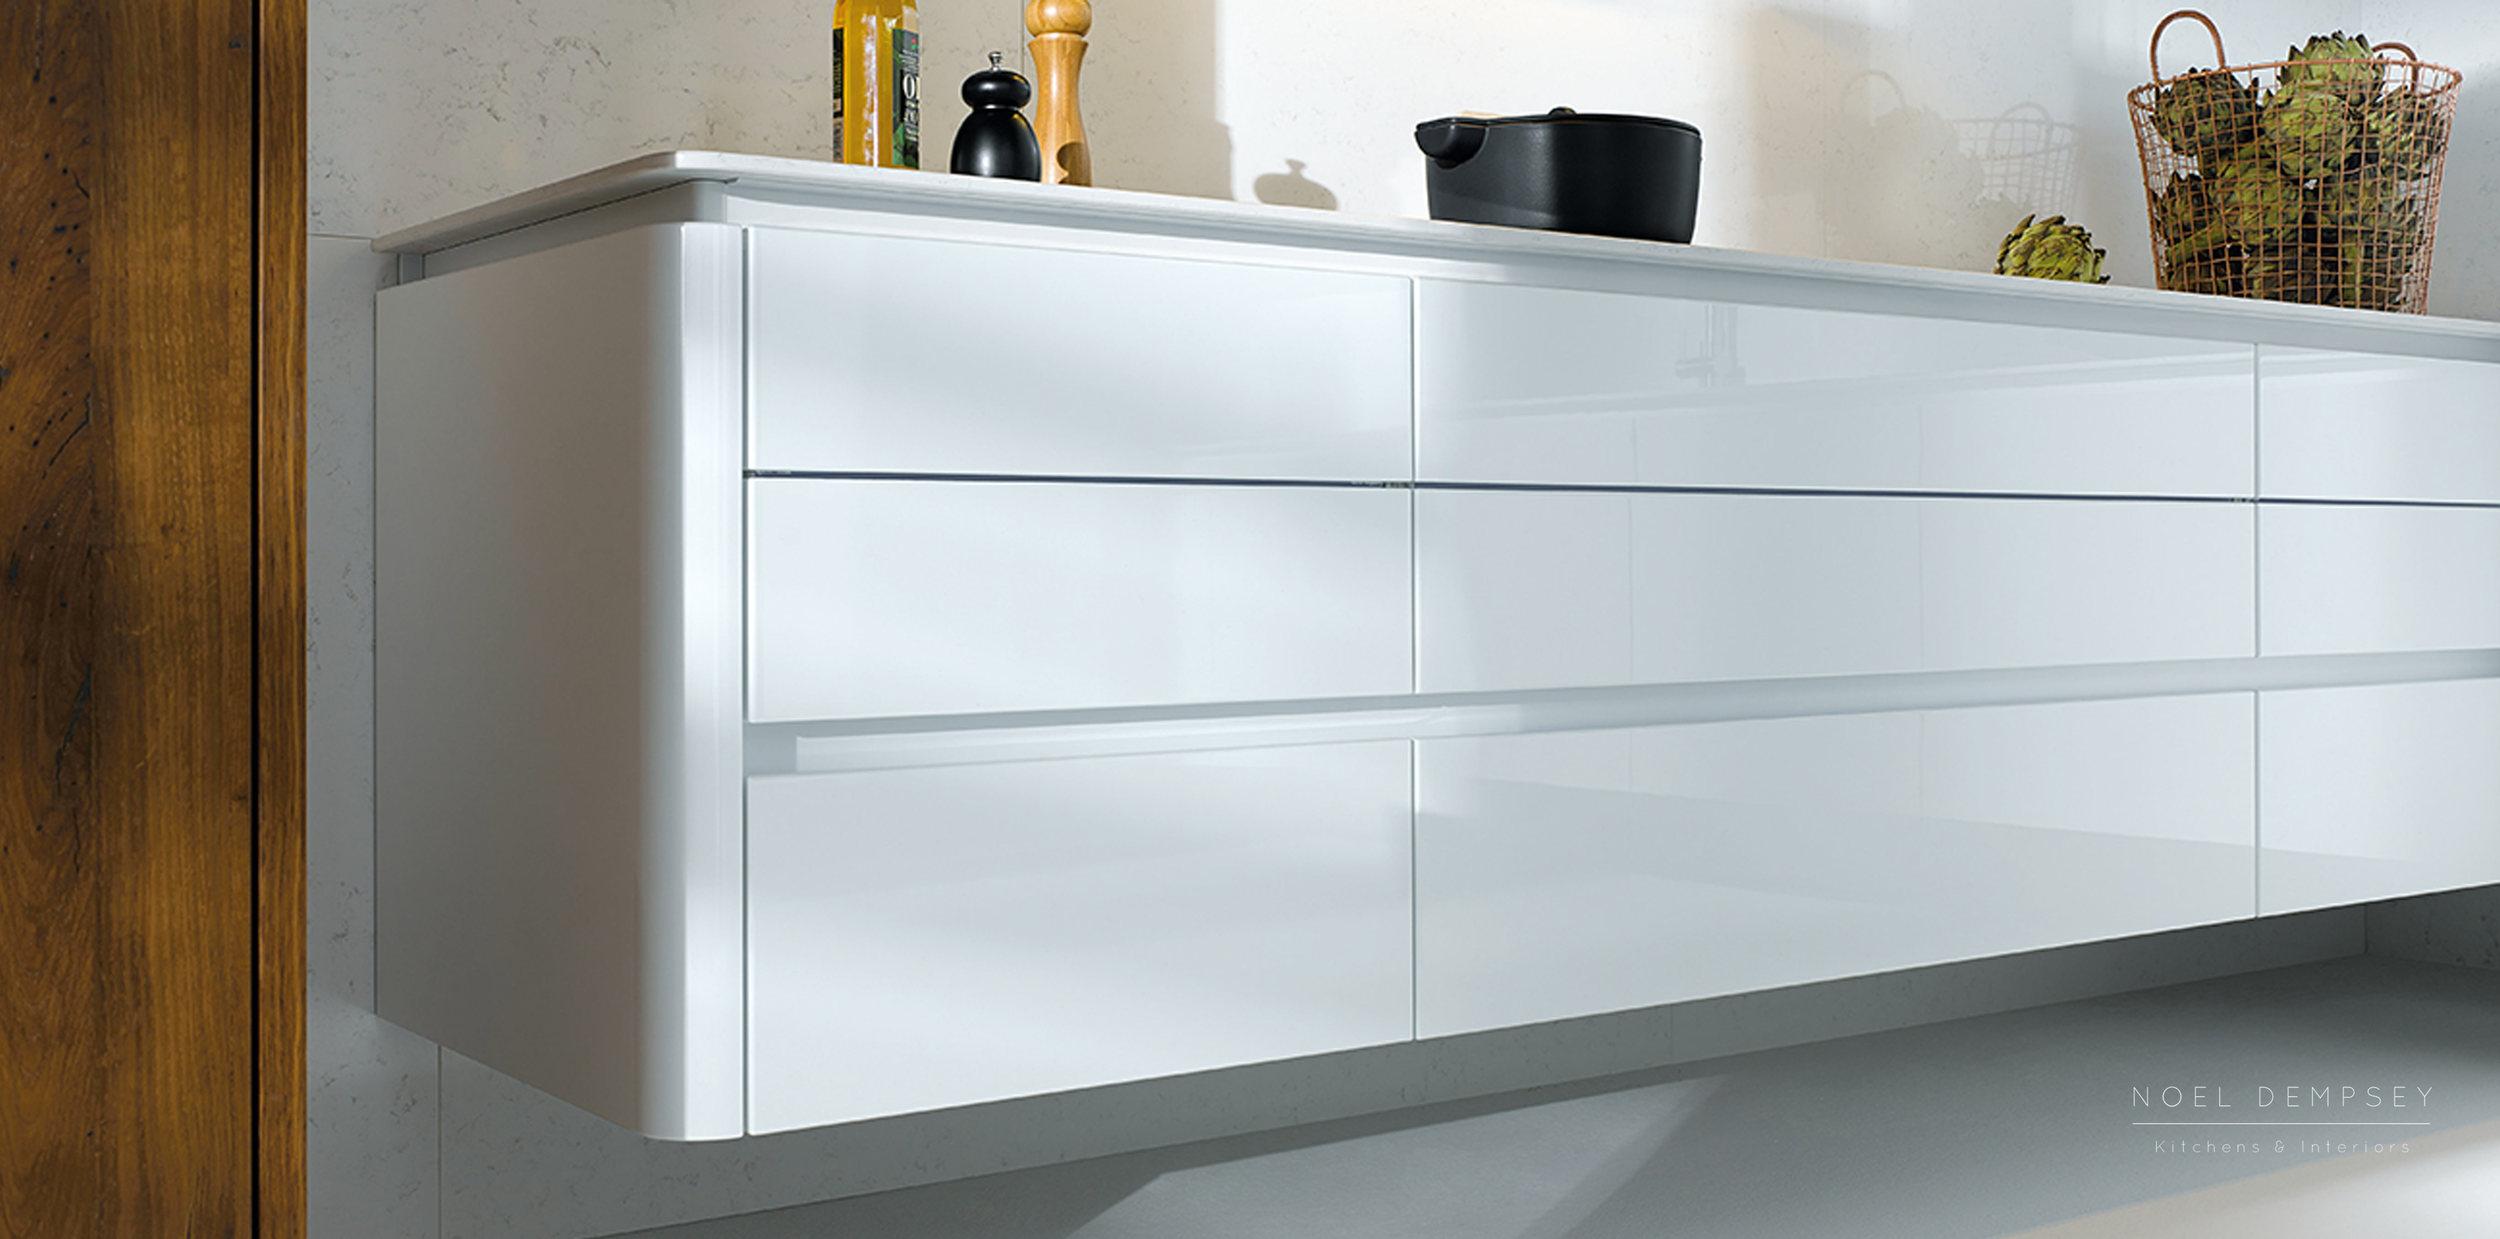 NX501-Crystal-White-Gloss-German-Kitchen-3.jpg